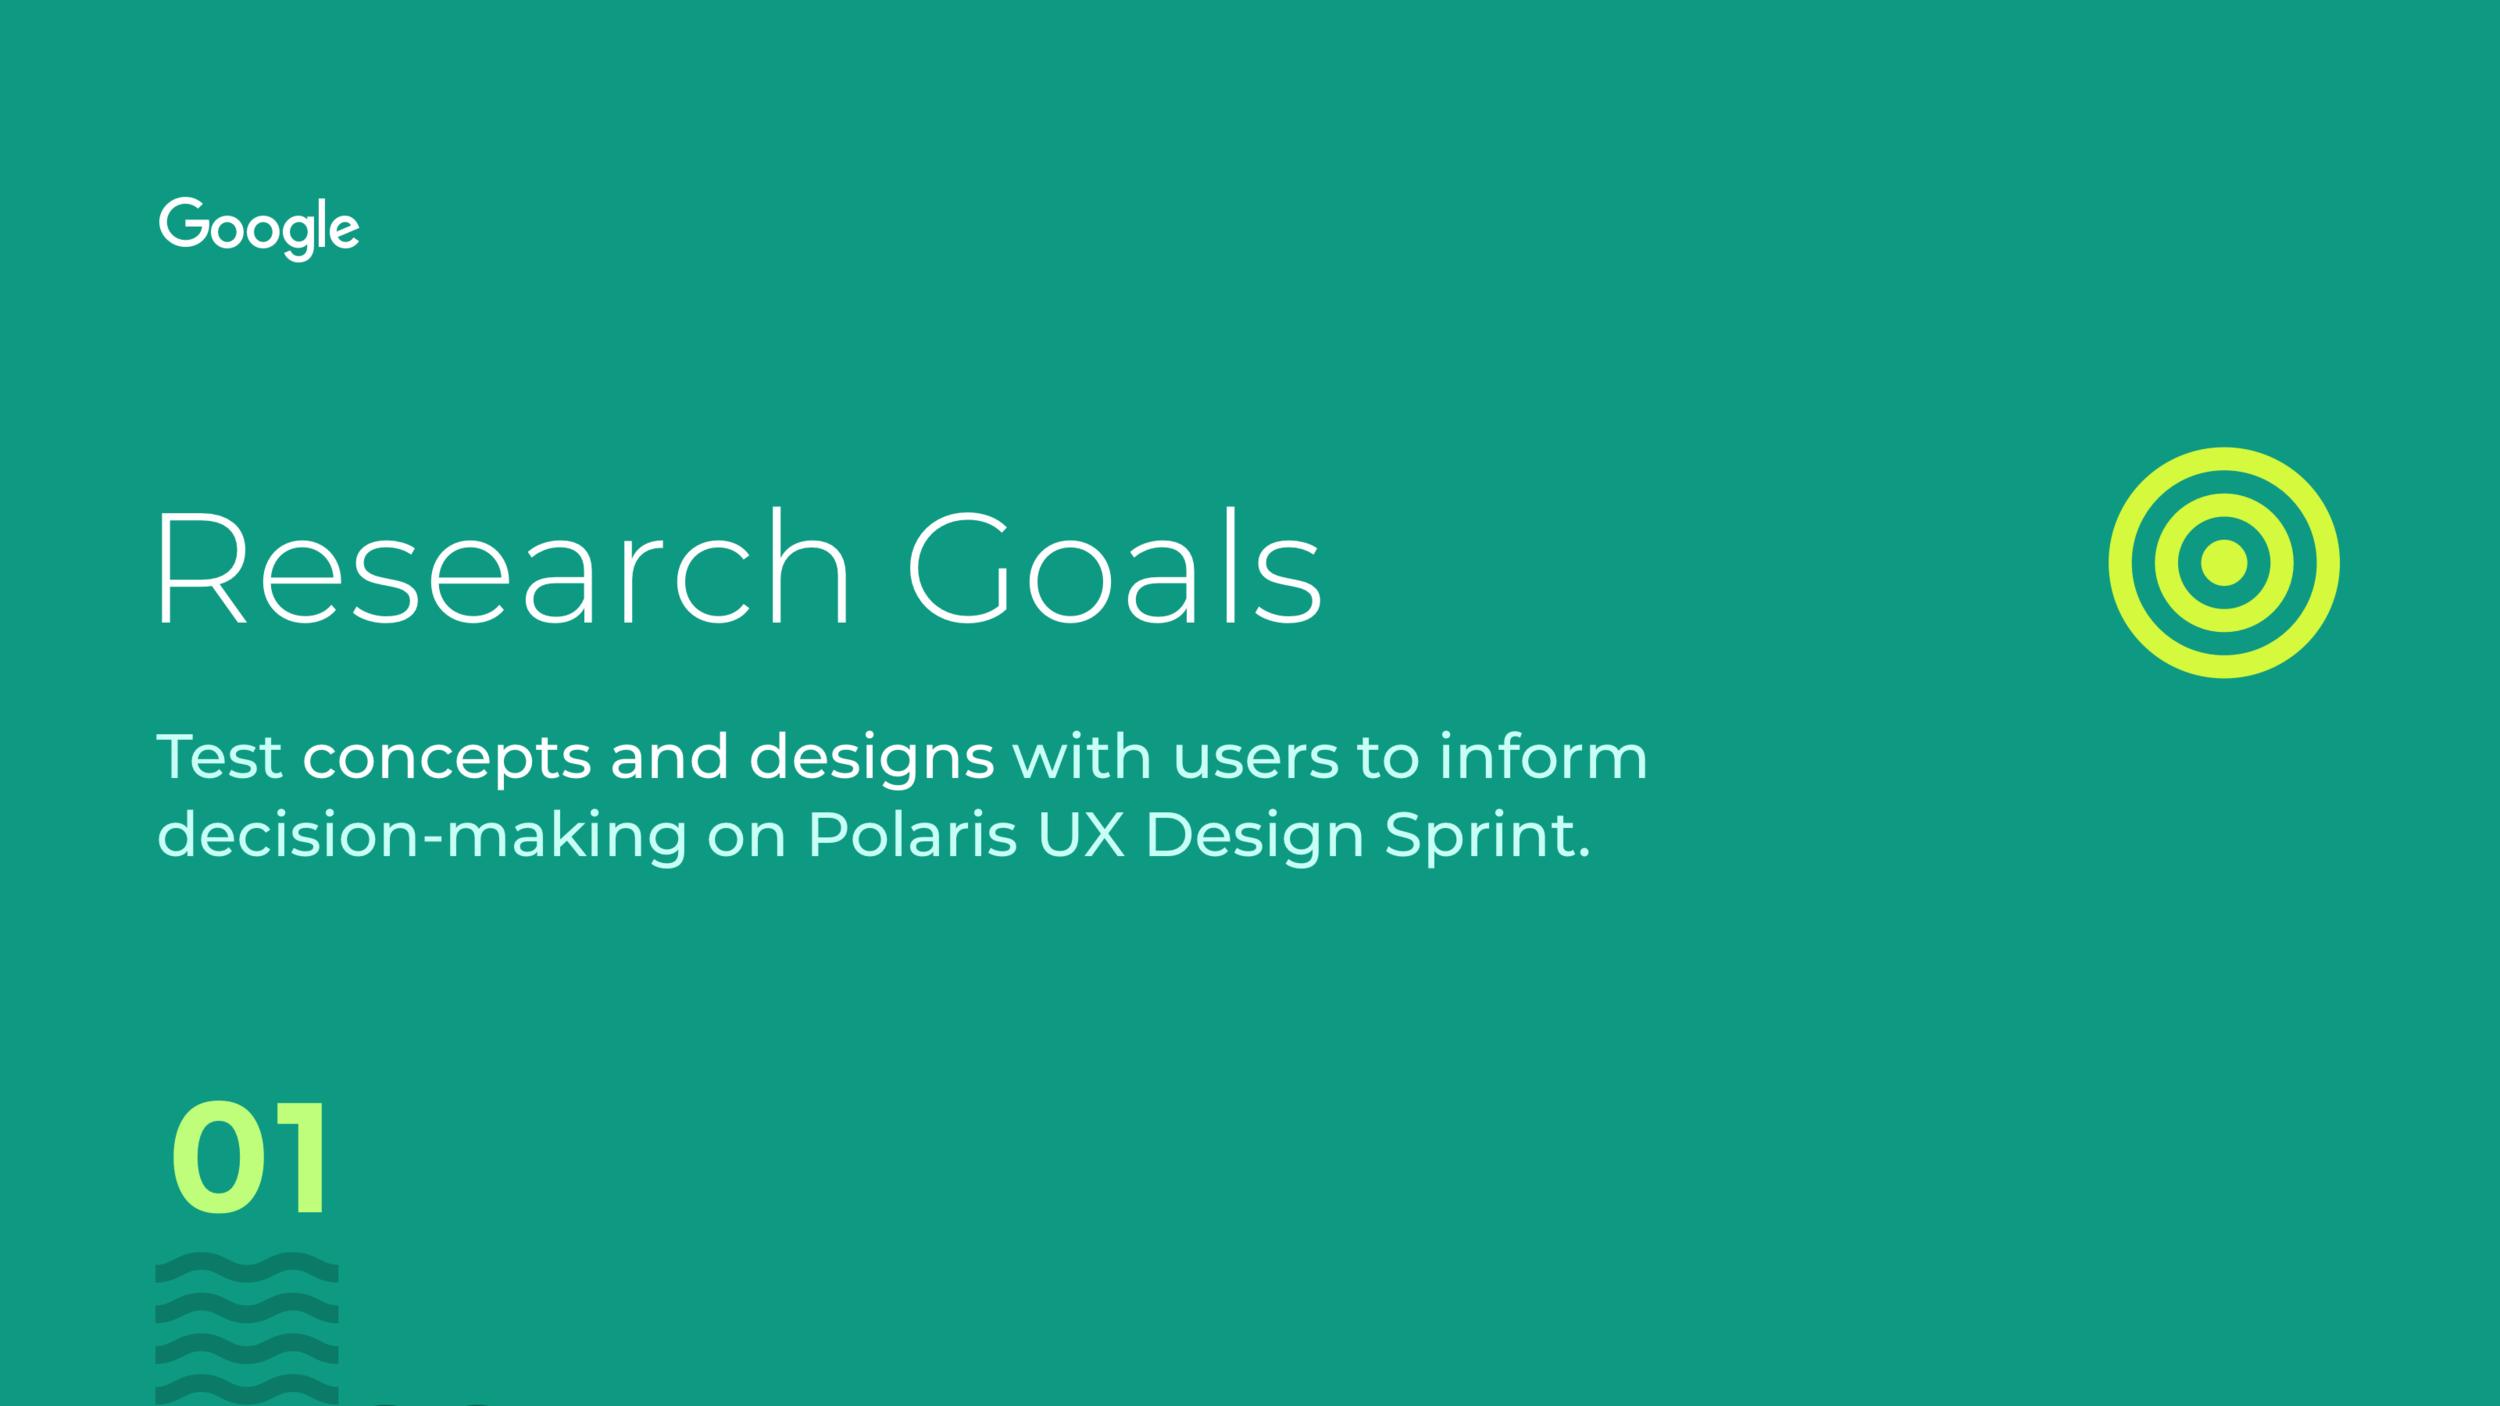 03. research goals.png